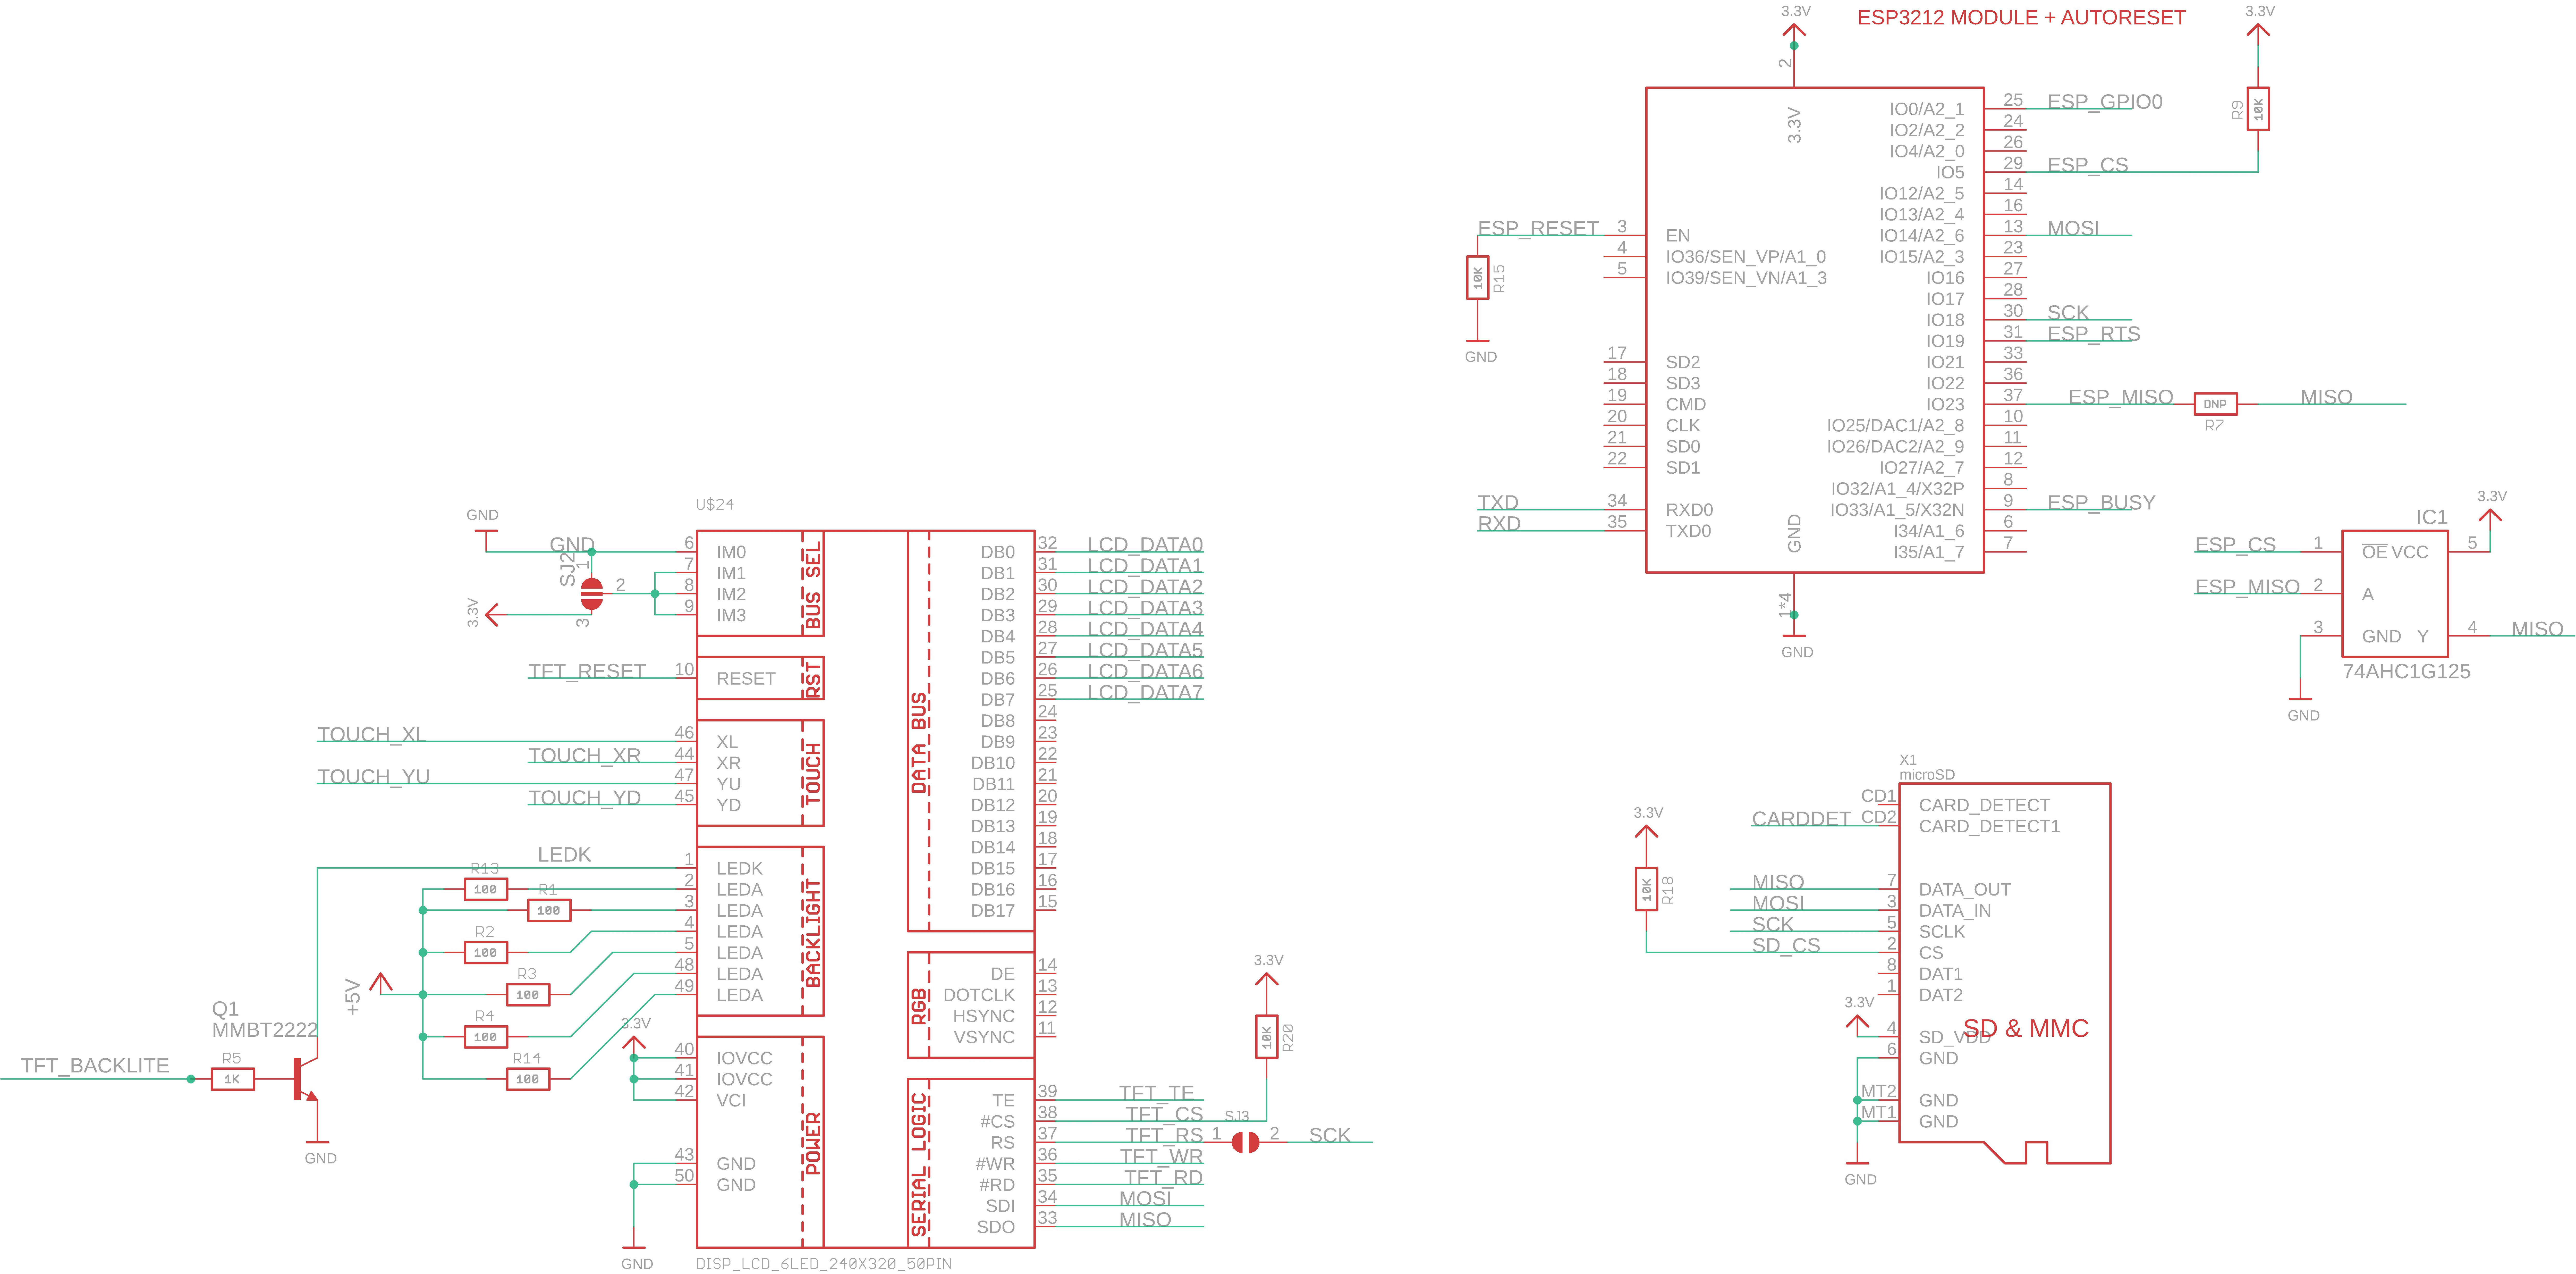 circuitpython_Adafruit_PyPortal_Sch1.png